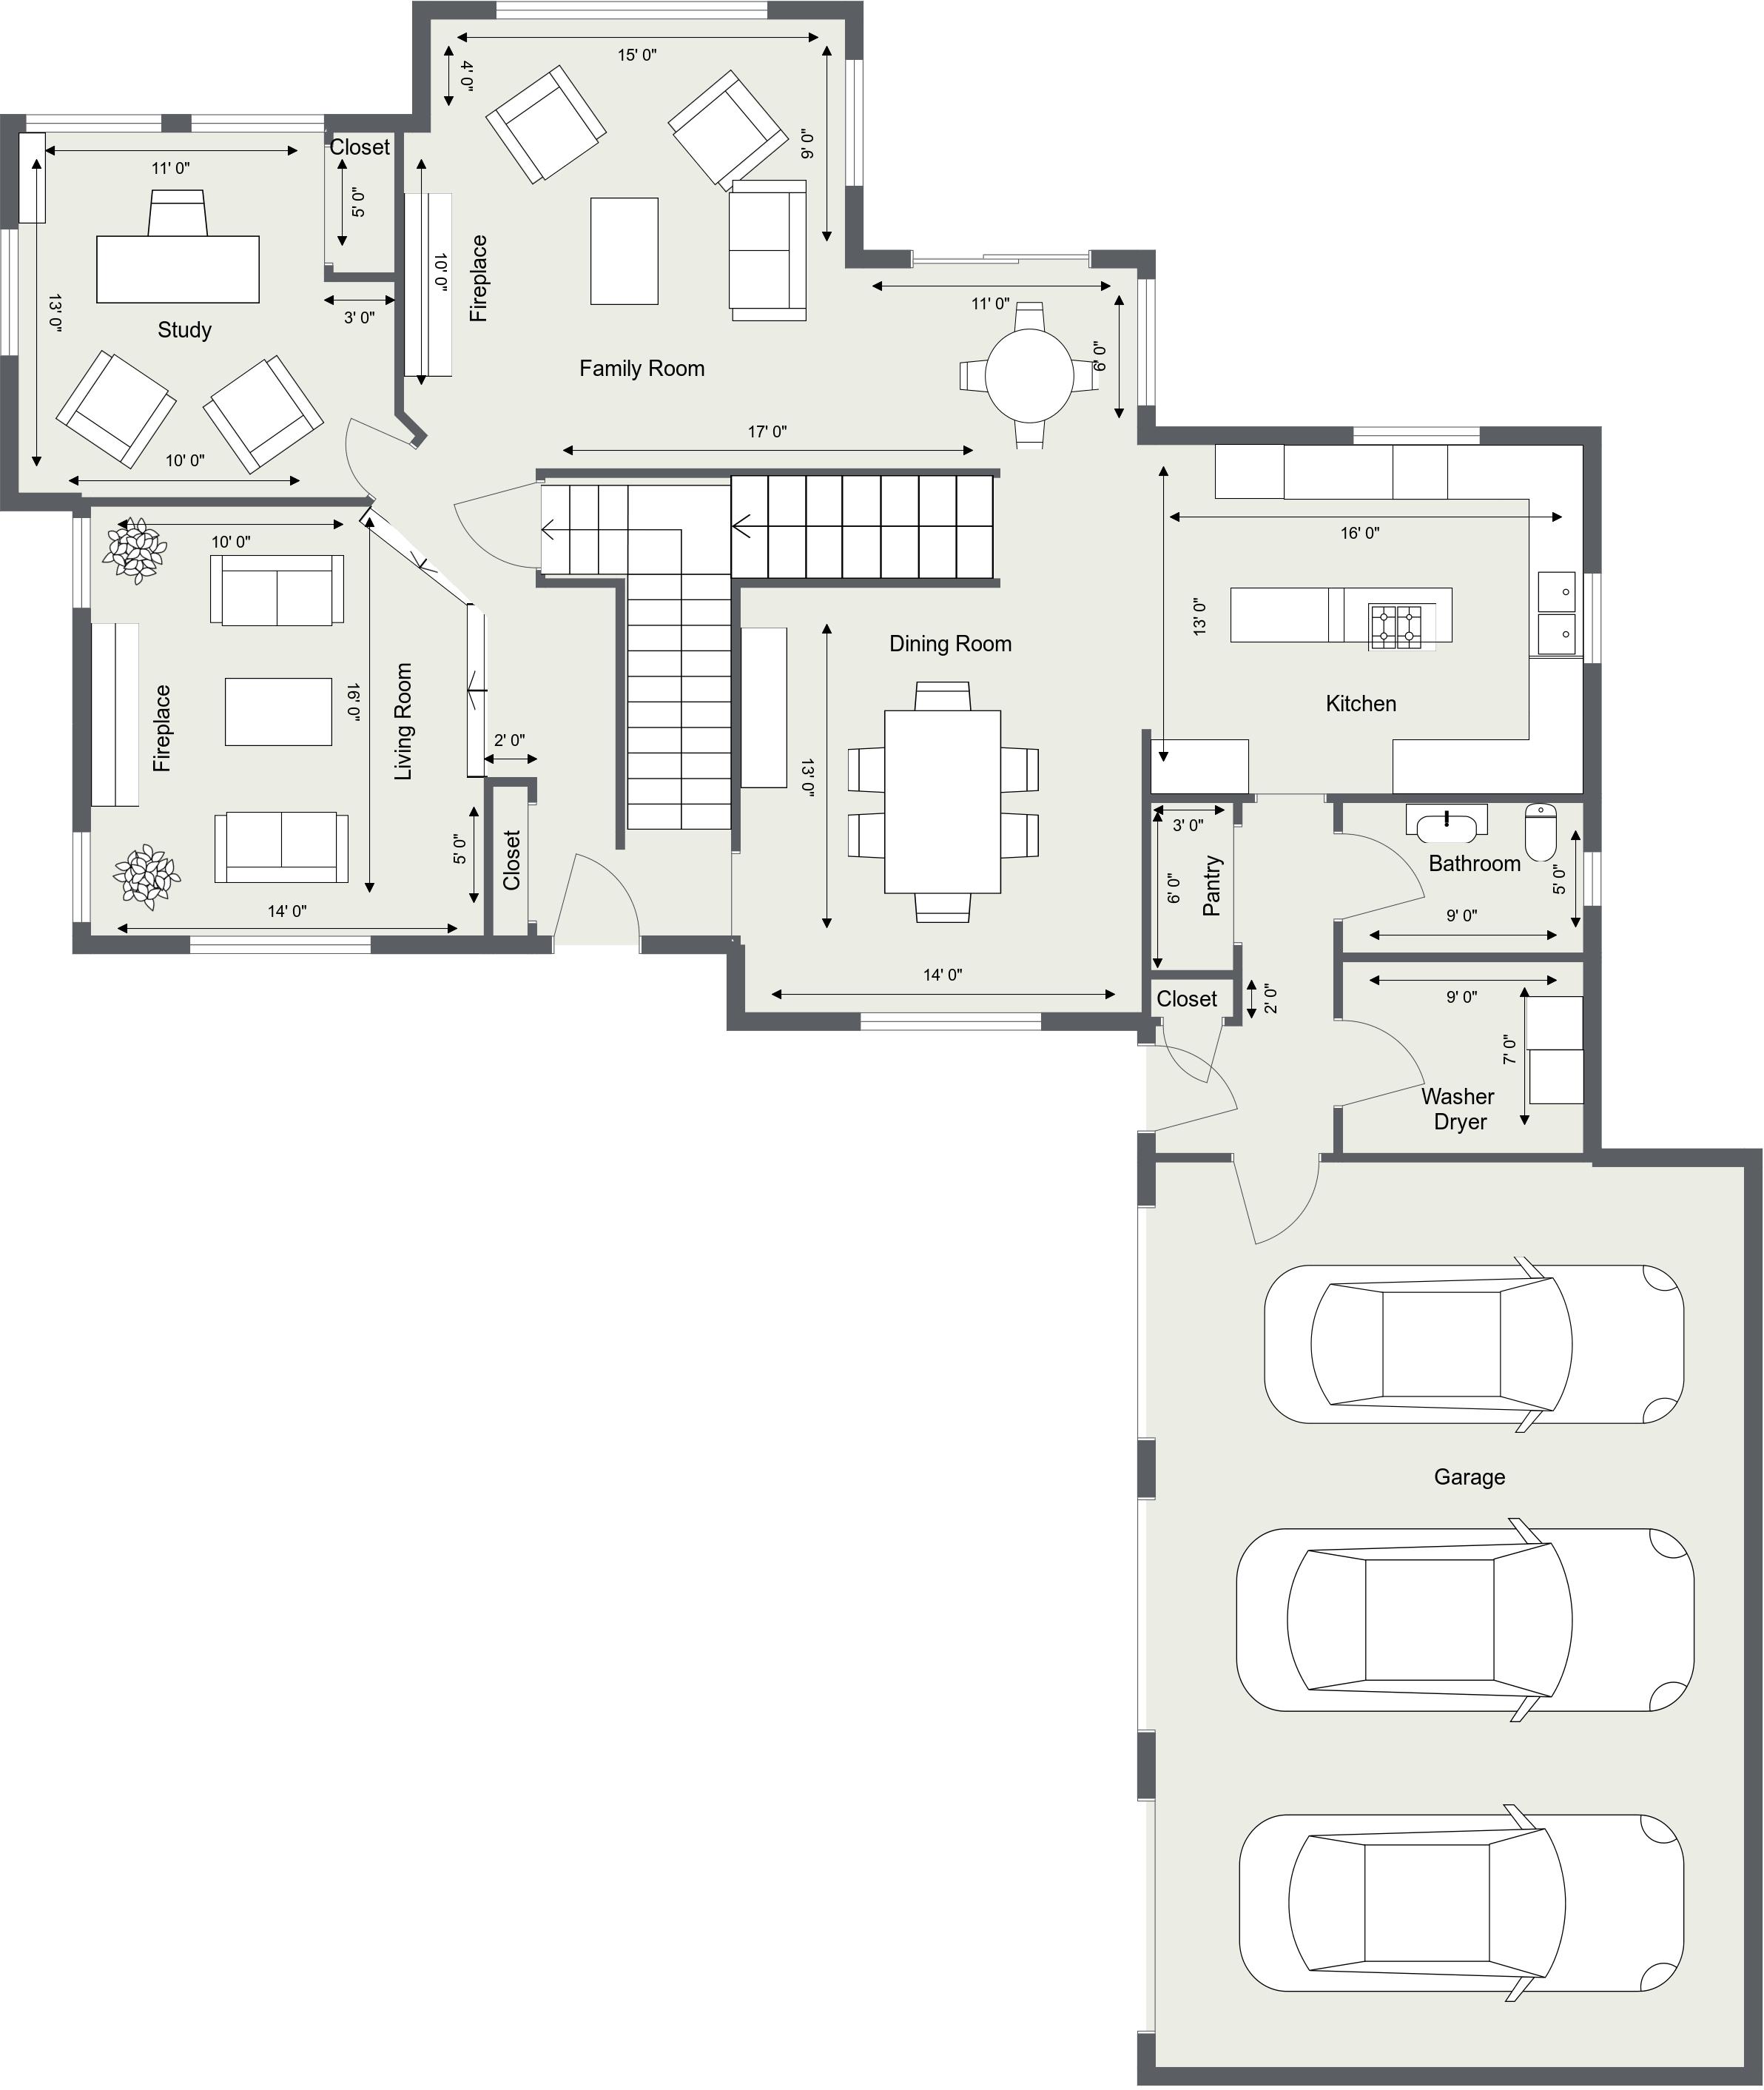 Rocky Hill - 1. Floor - 2D Floor Plan.jpg